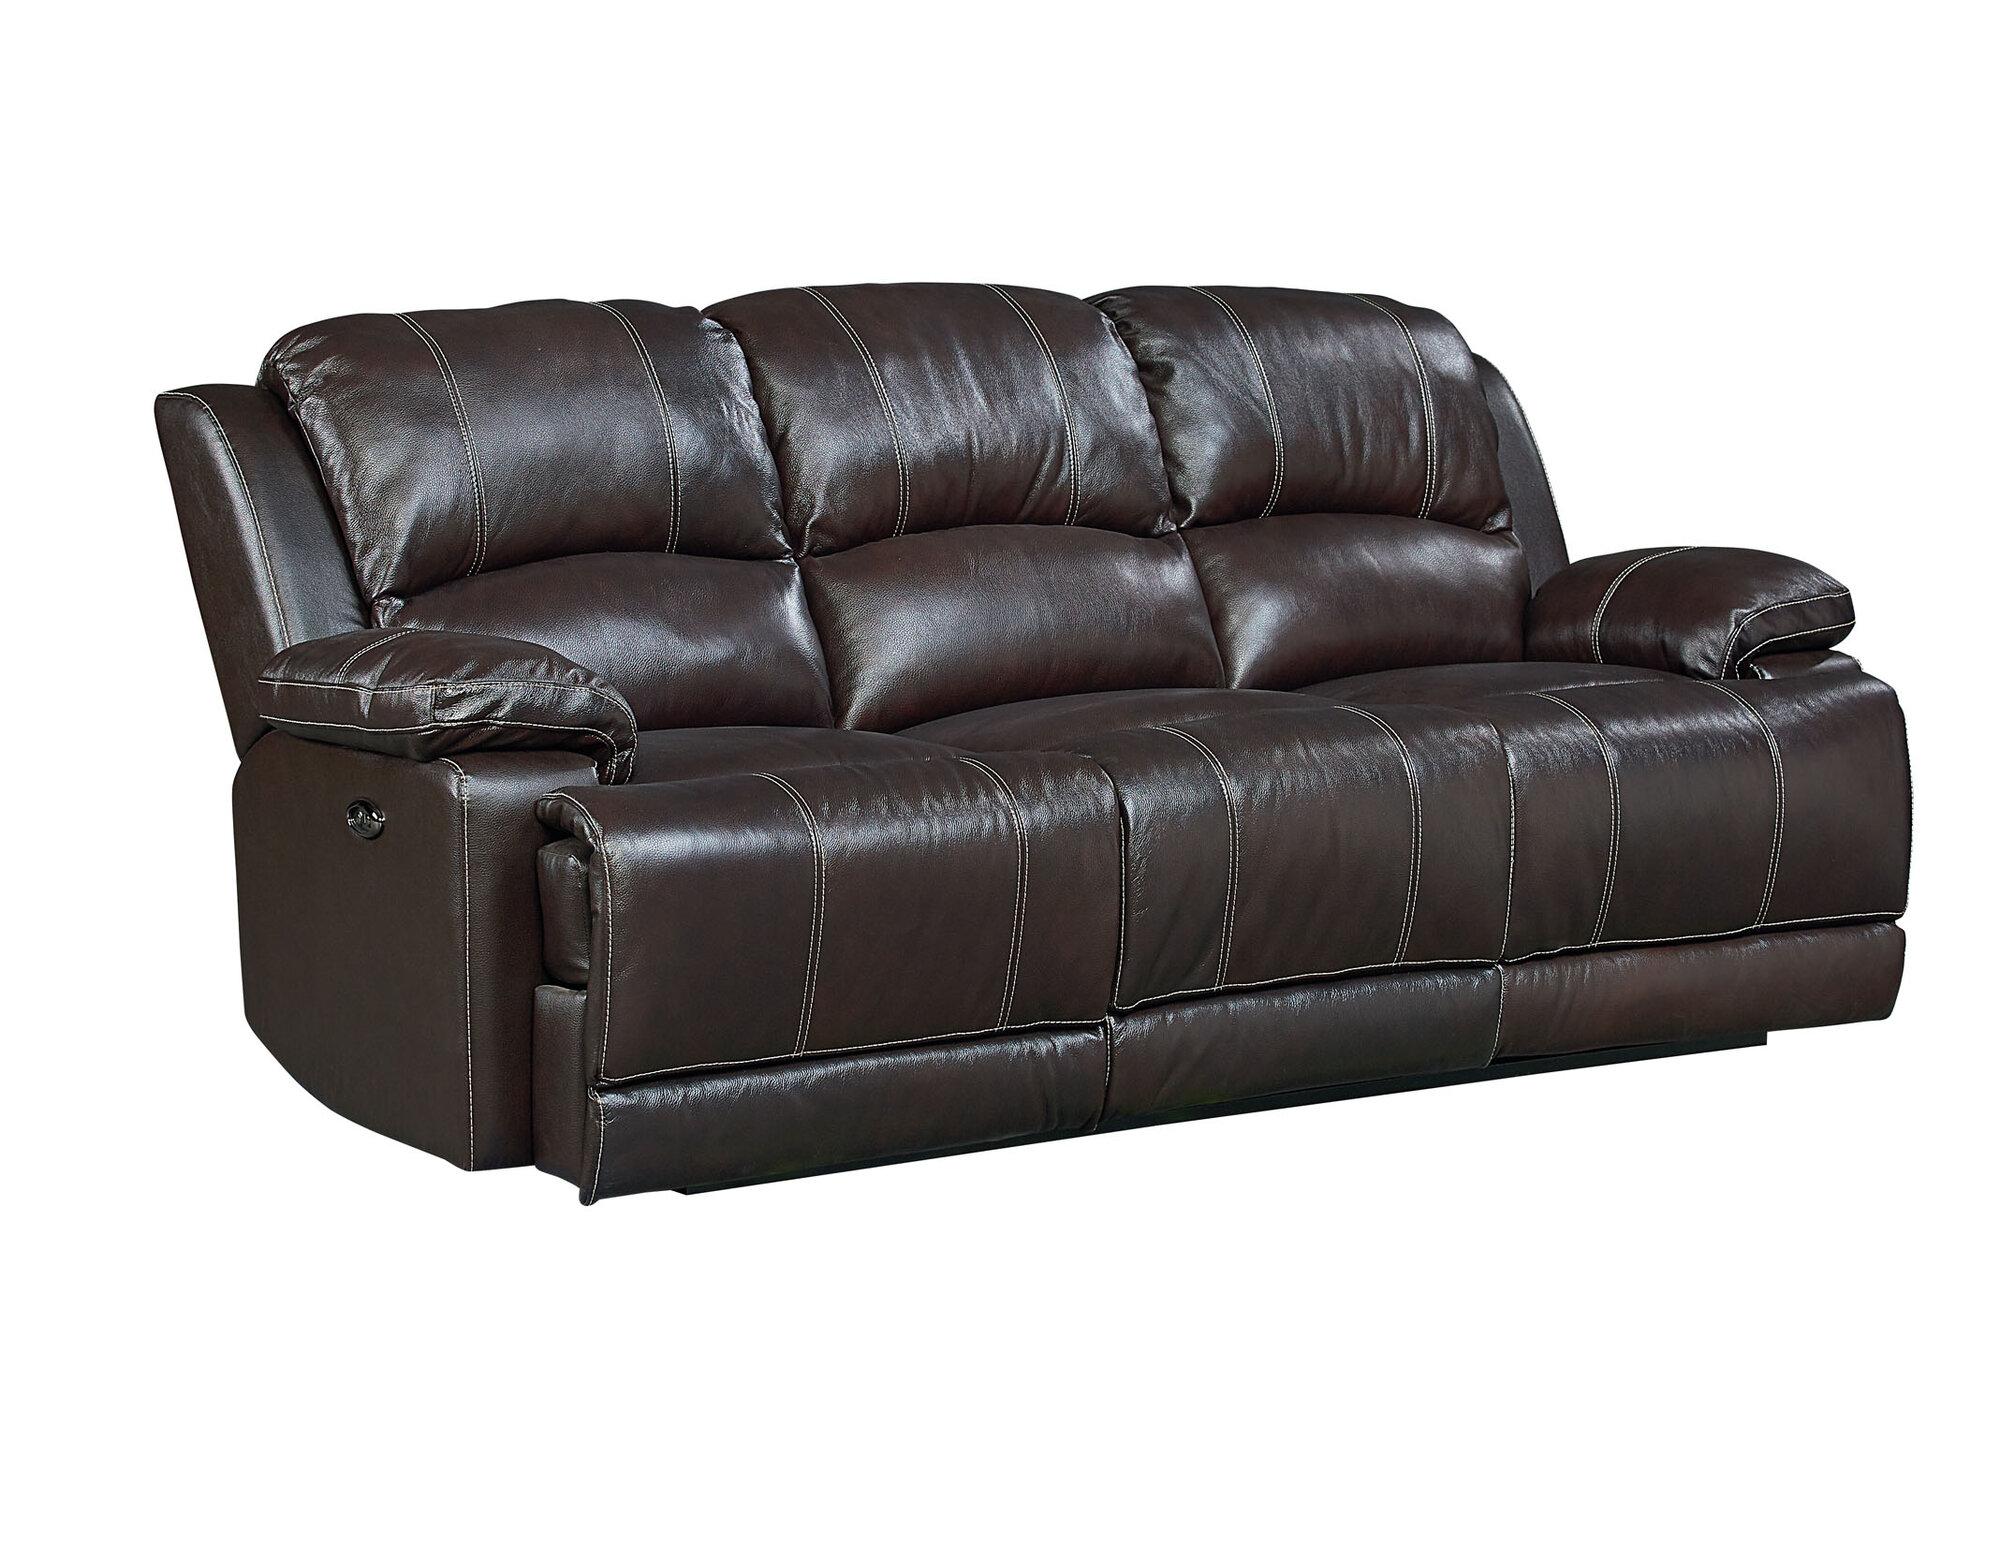 Red Barrel Studio Garlock Leather Reclining Sofa   eBay